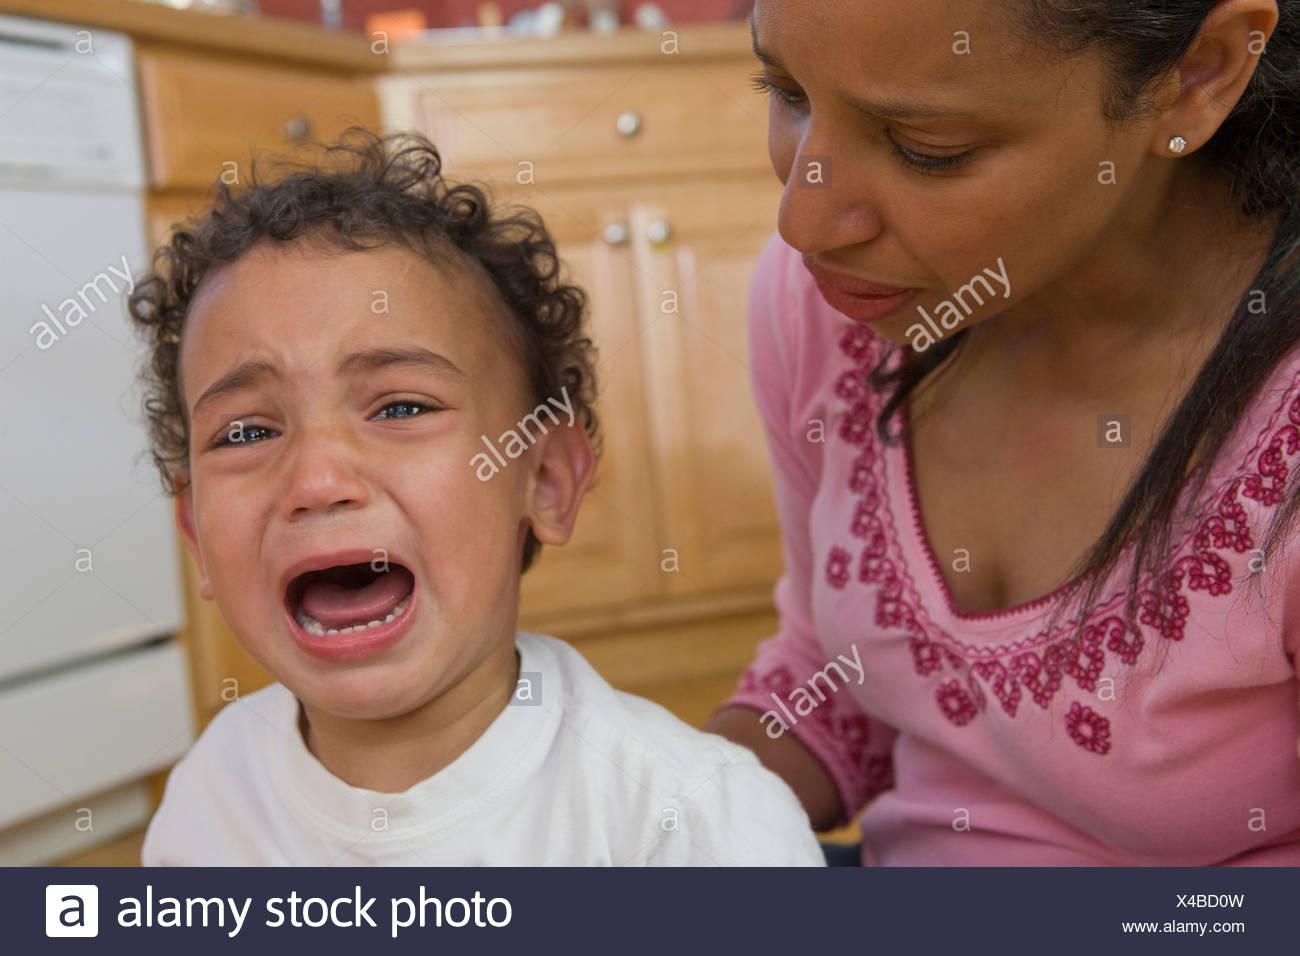 Preocupado Hispanic madre llorando al lado de su hijo Foto de stock